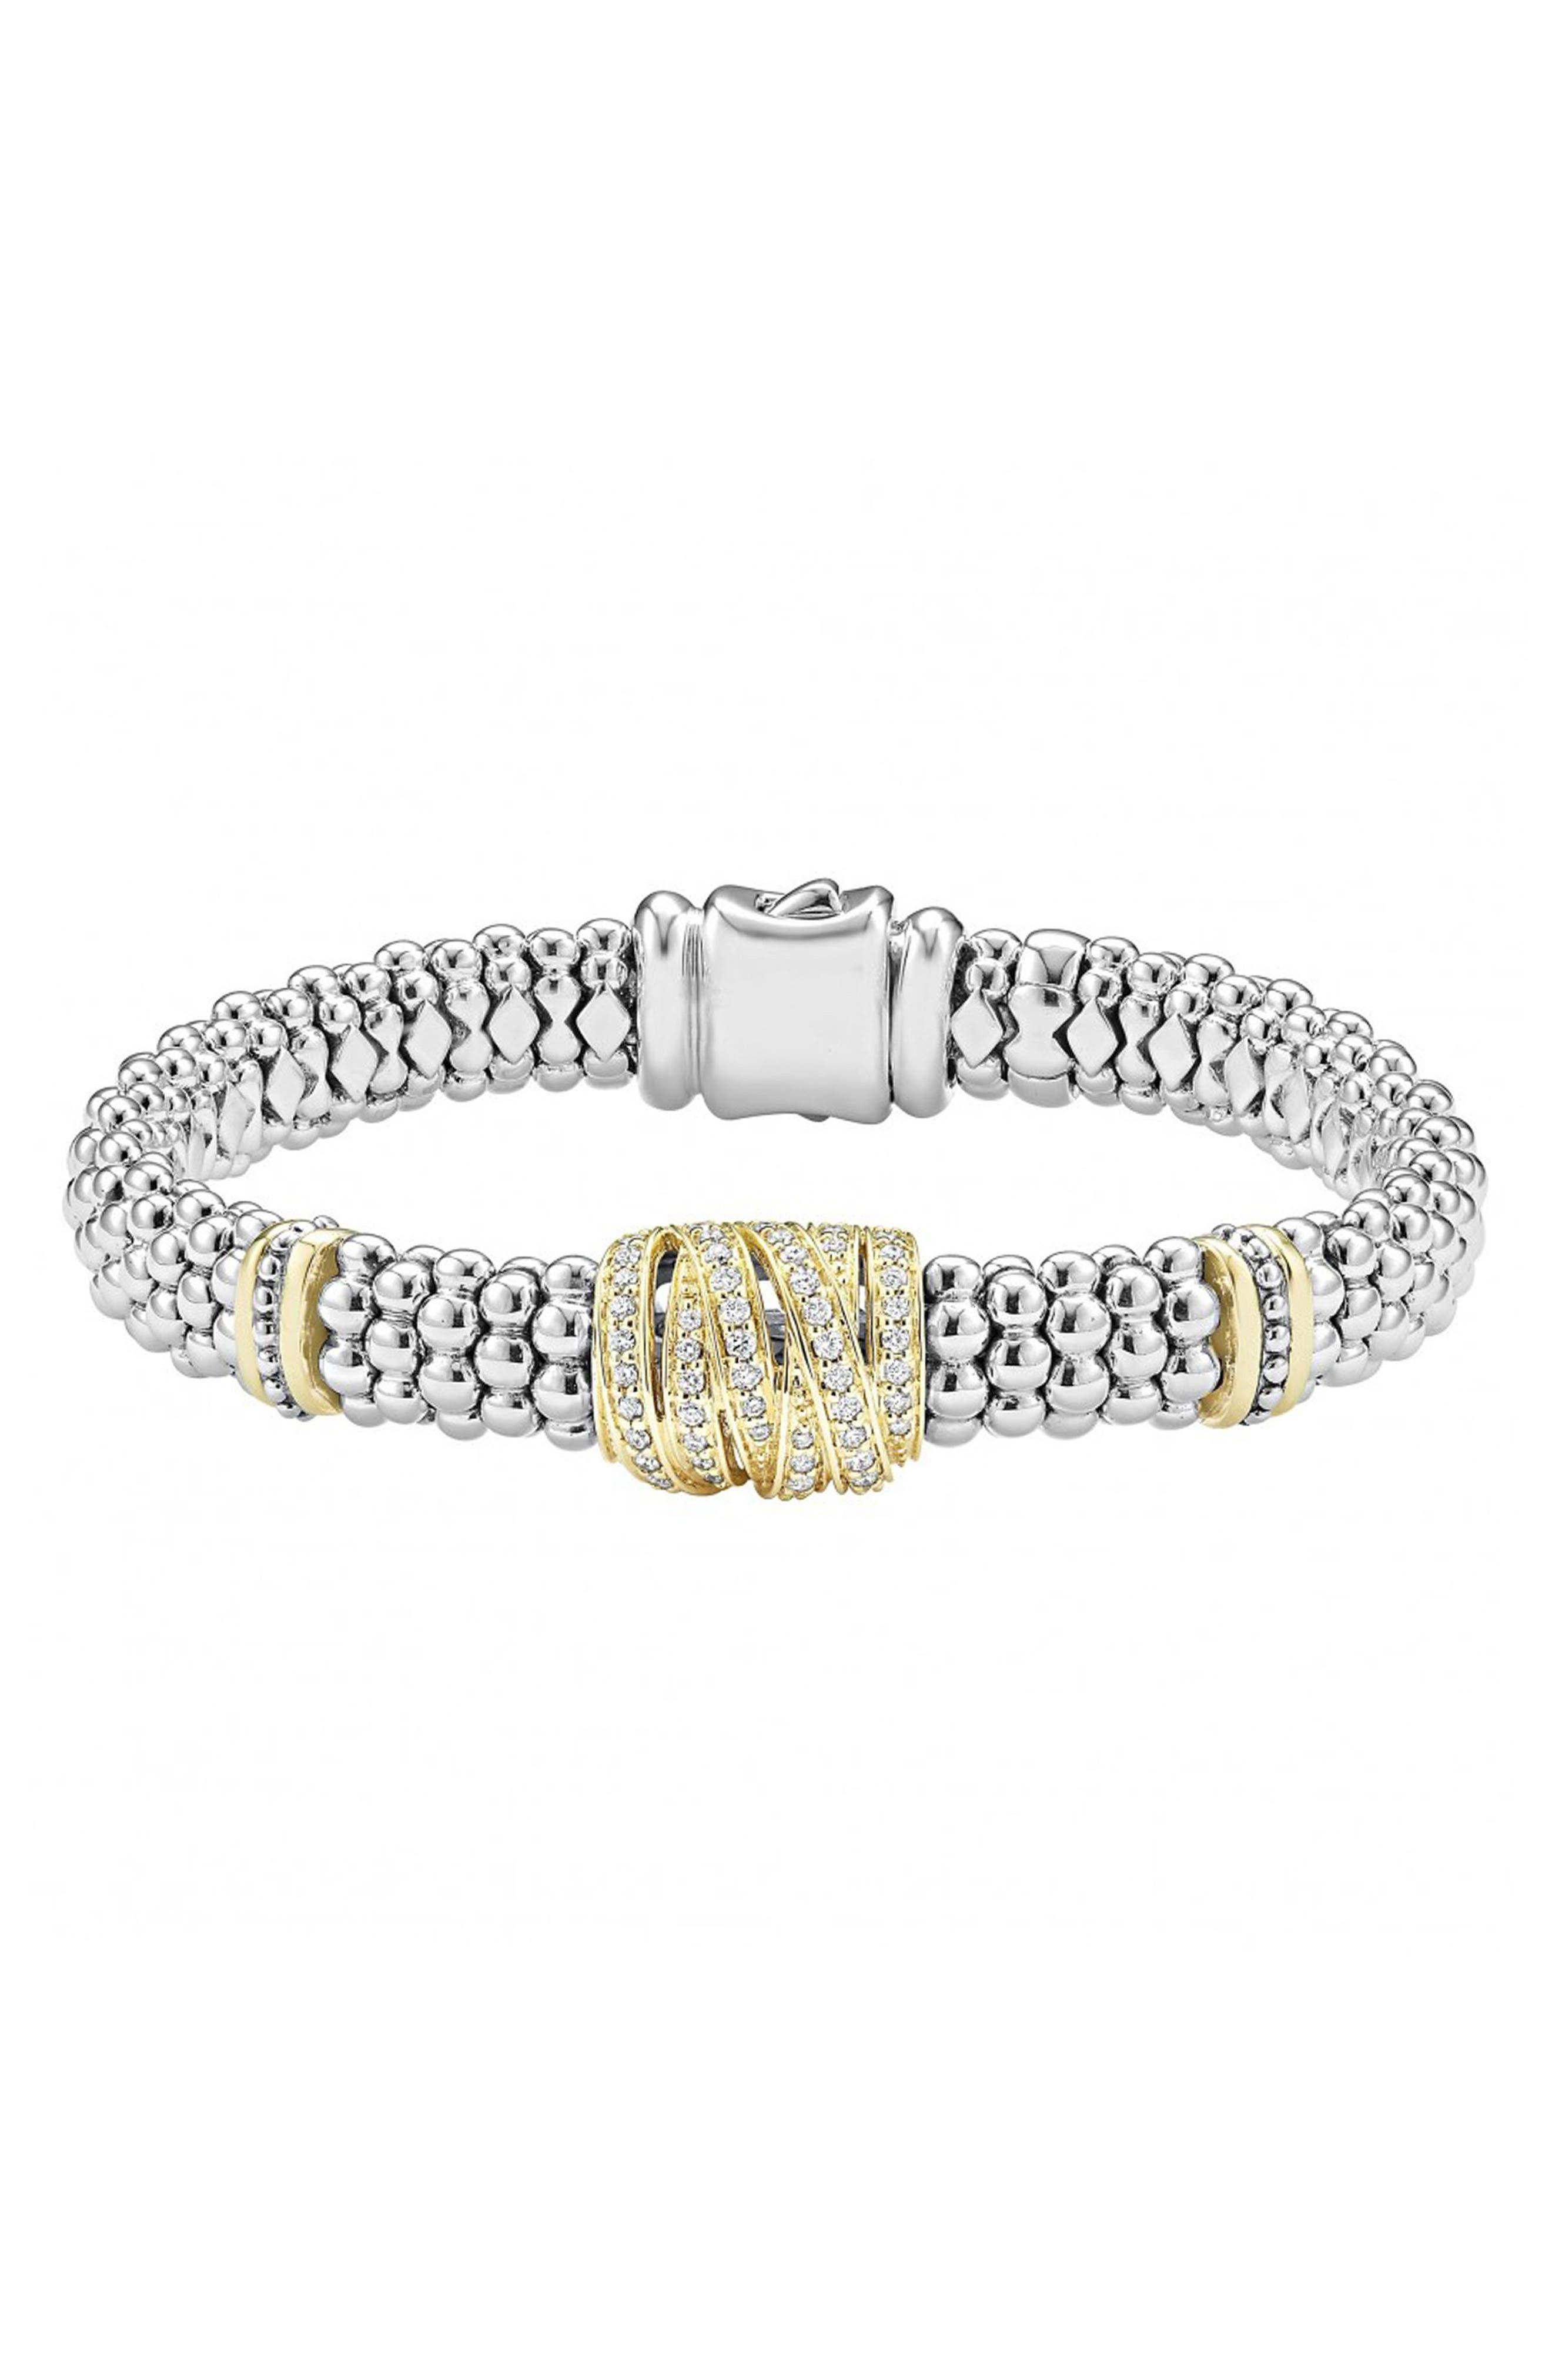 'Diamonds & Caviar' Diamond Rope Bracelet,                             Main thumbnail 1, color,                             Sterling Silver/ Gold